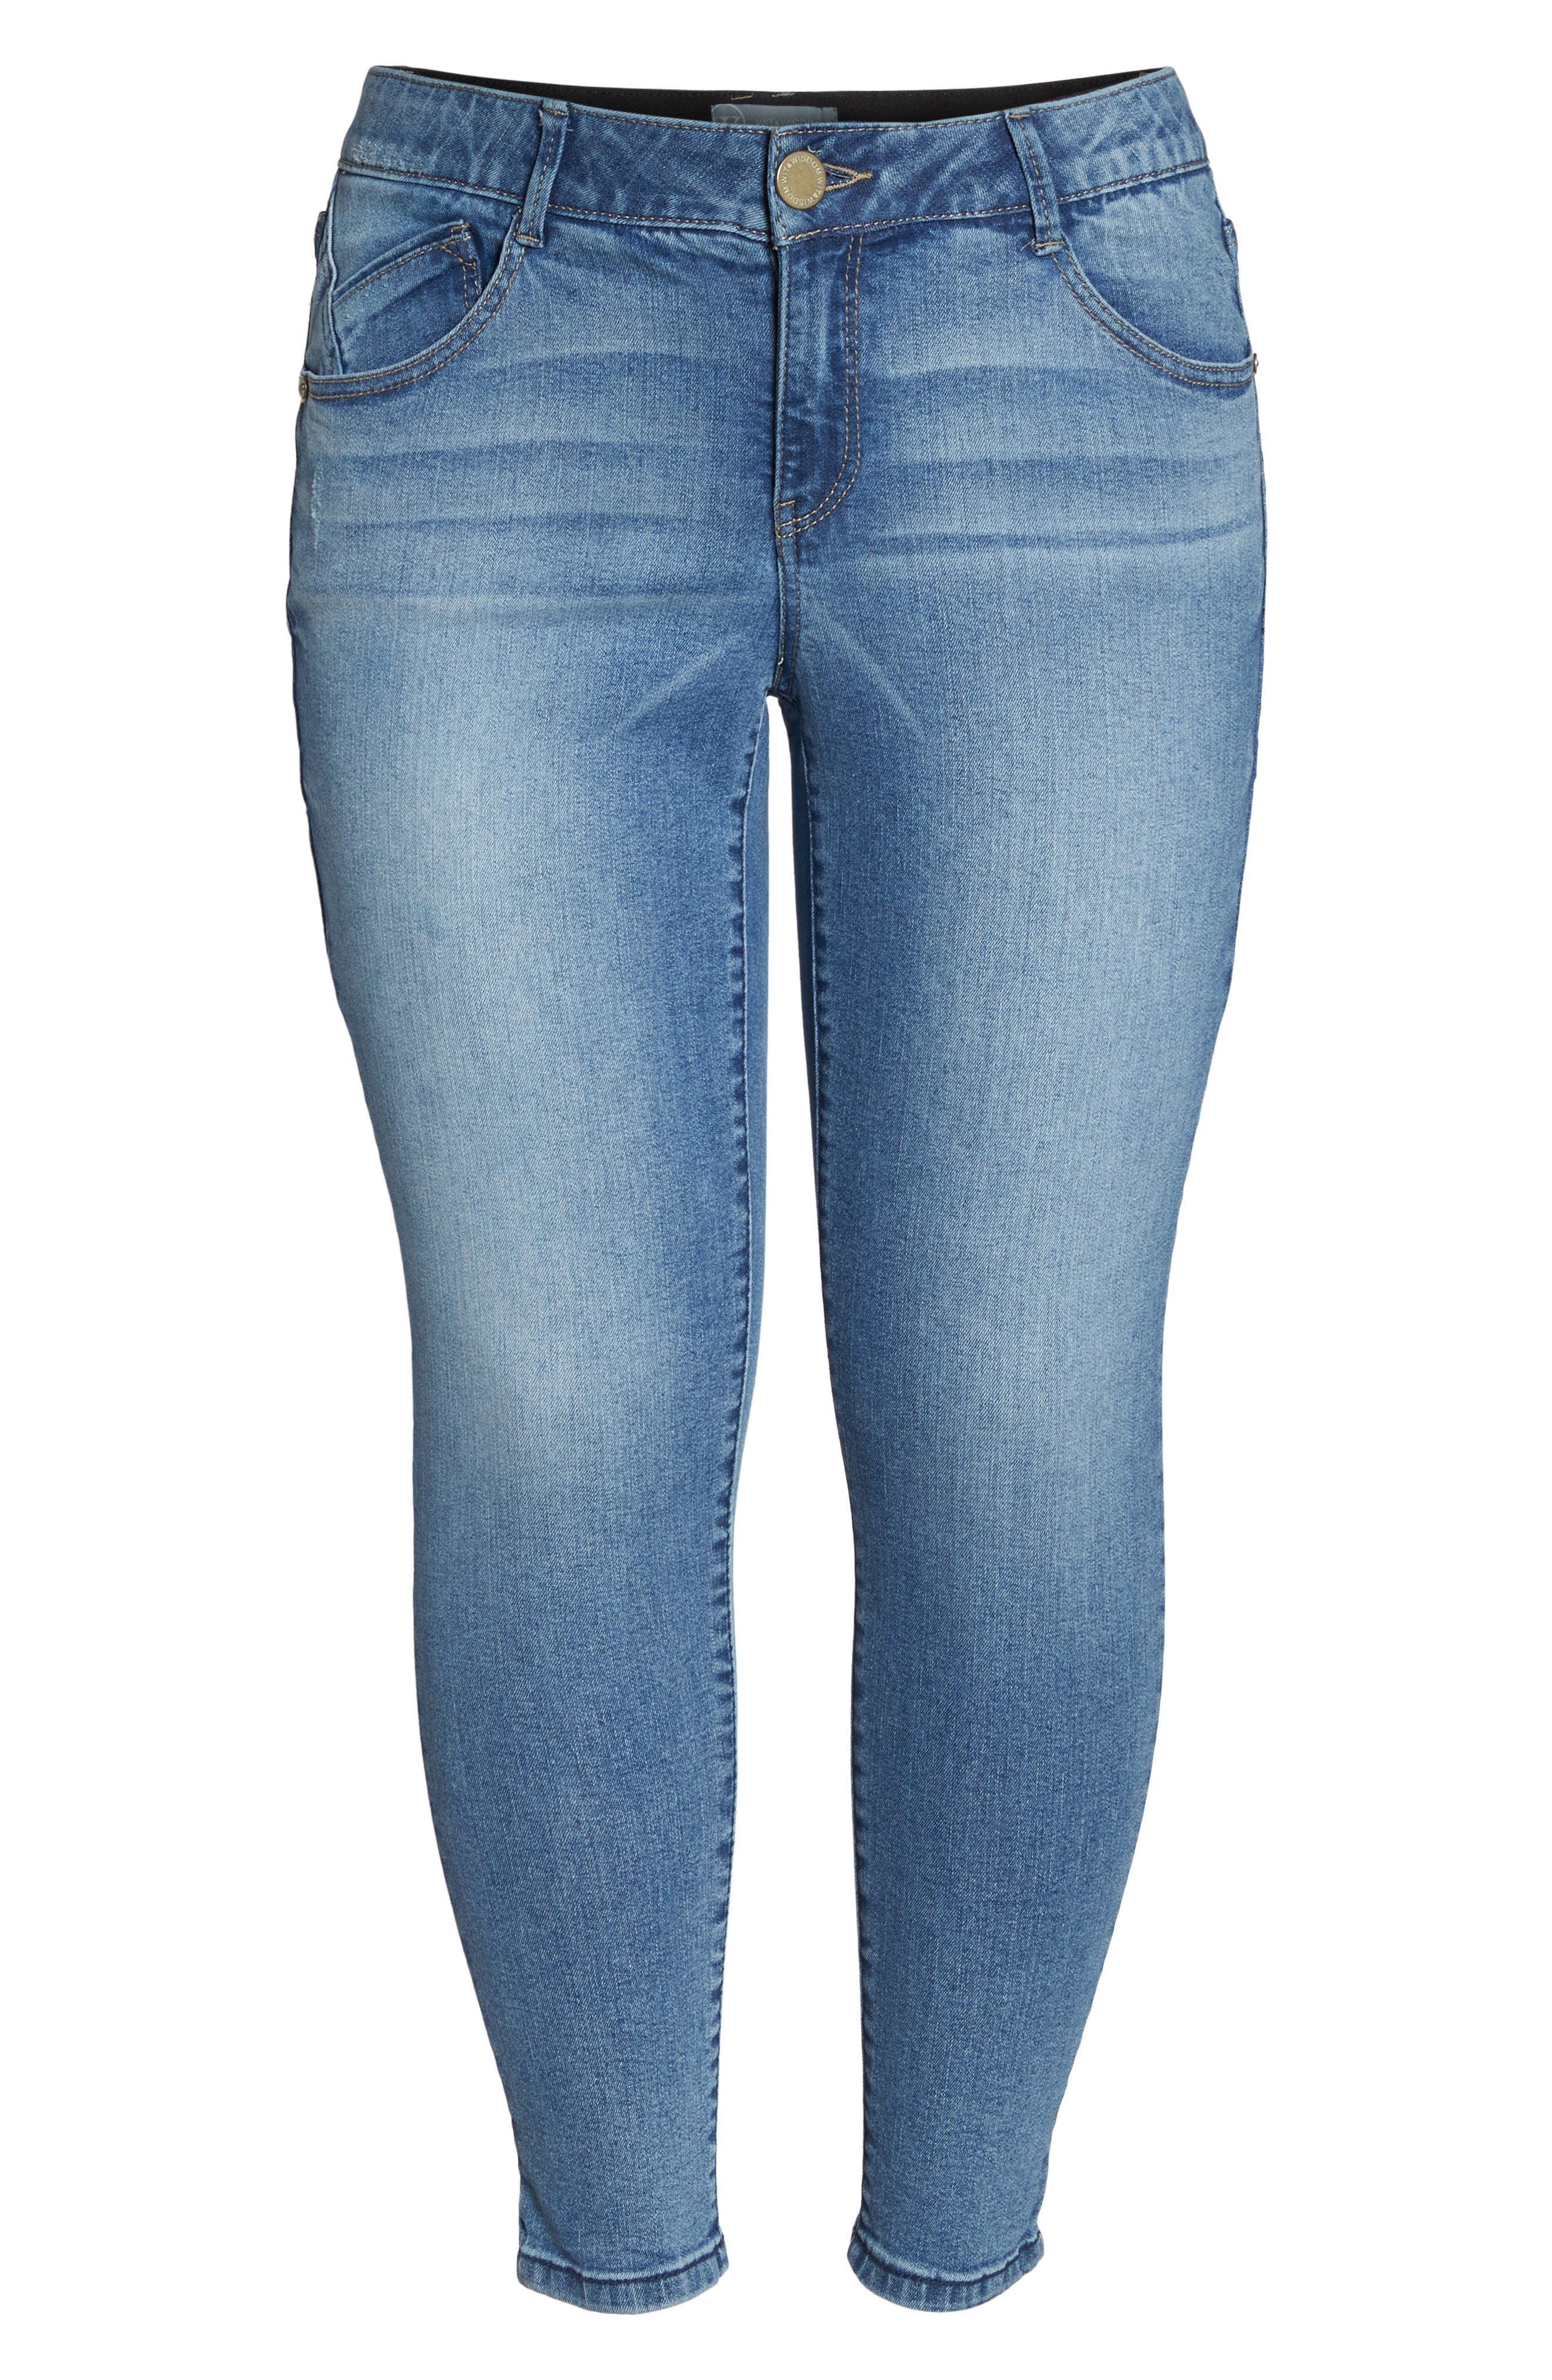 Ab-solution Stretch Ankle Skimmer Jeans,                             Alternate thumbnail 7, color,                             Light Blue